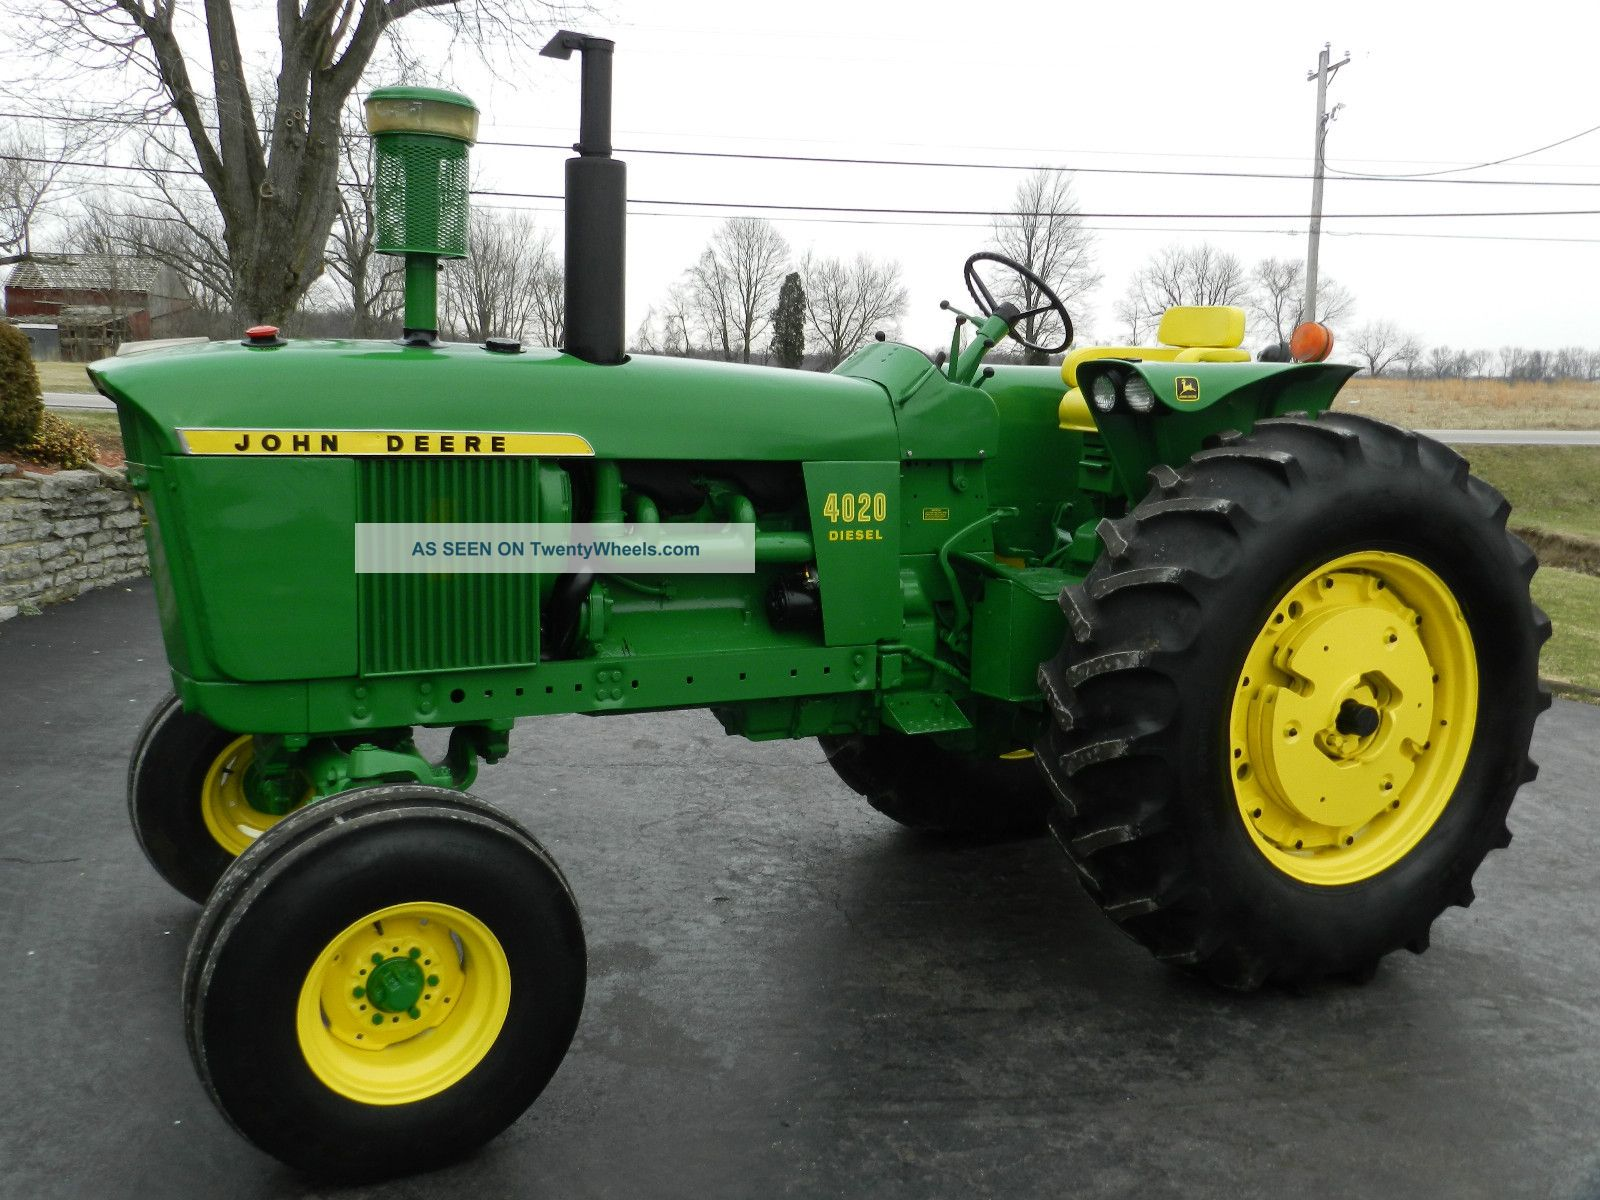 John Deere 4020 Tractor - Diesel - Restored - Sharp